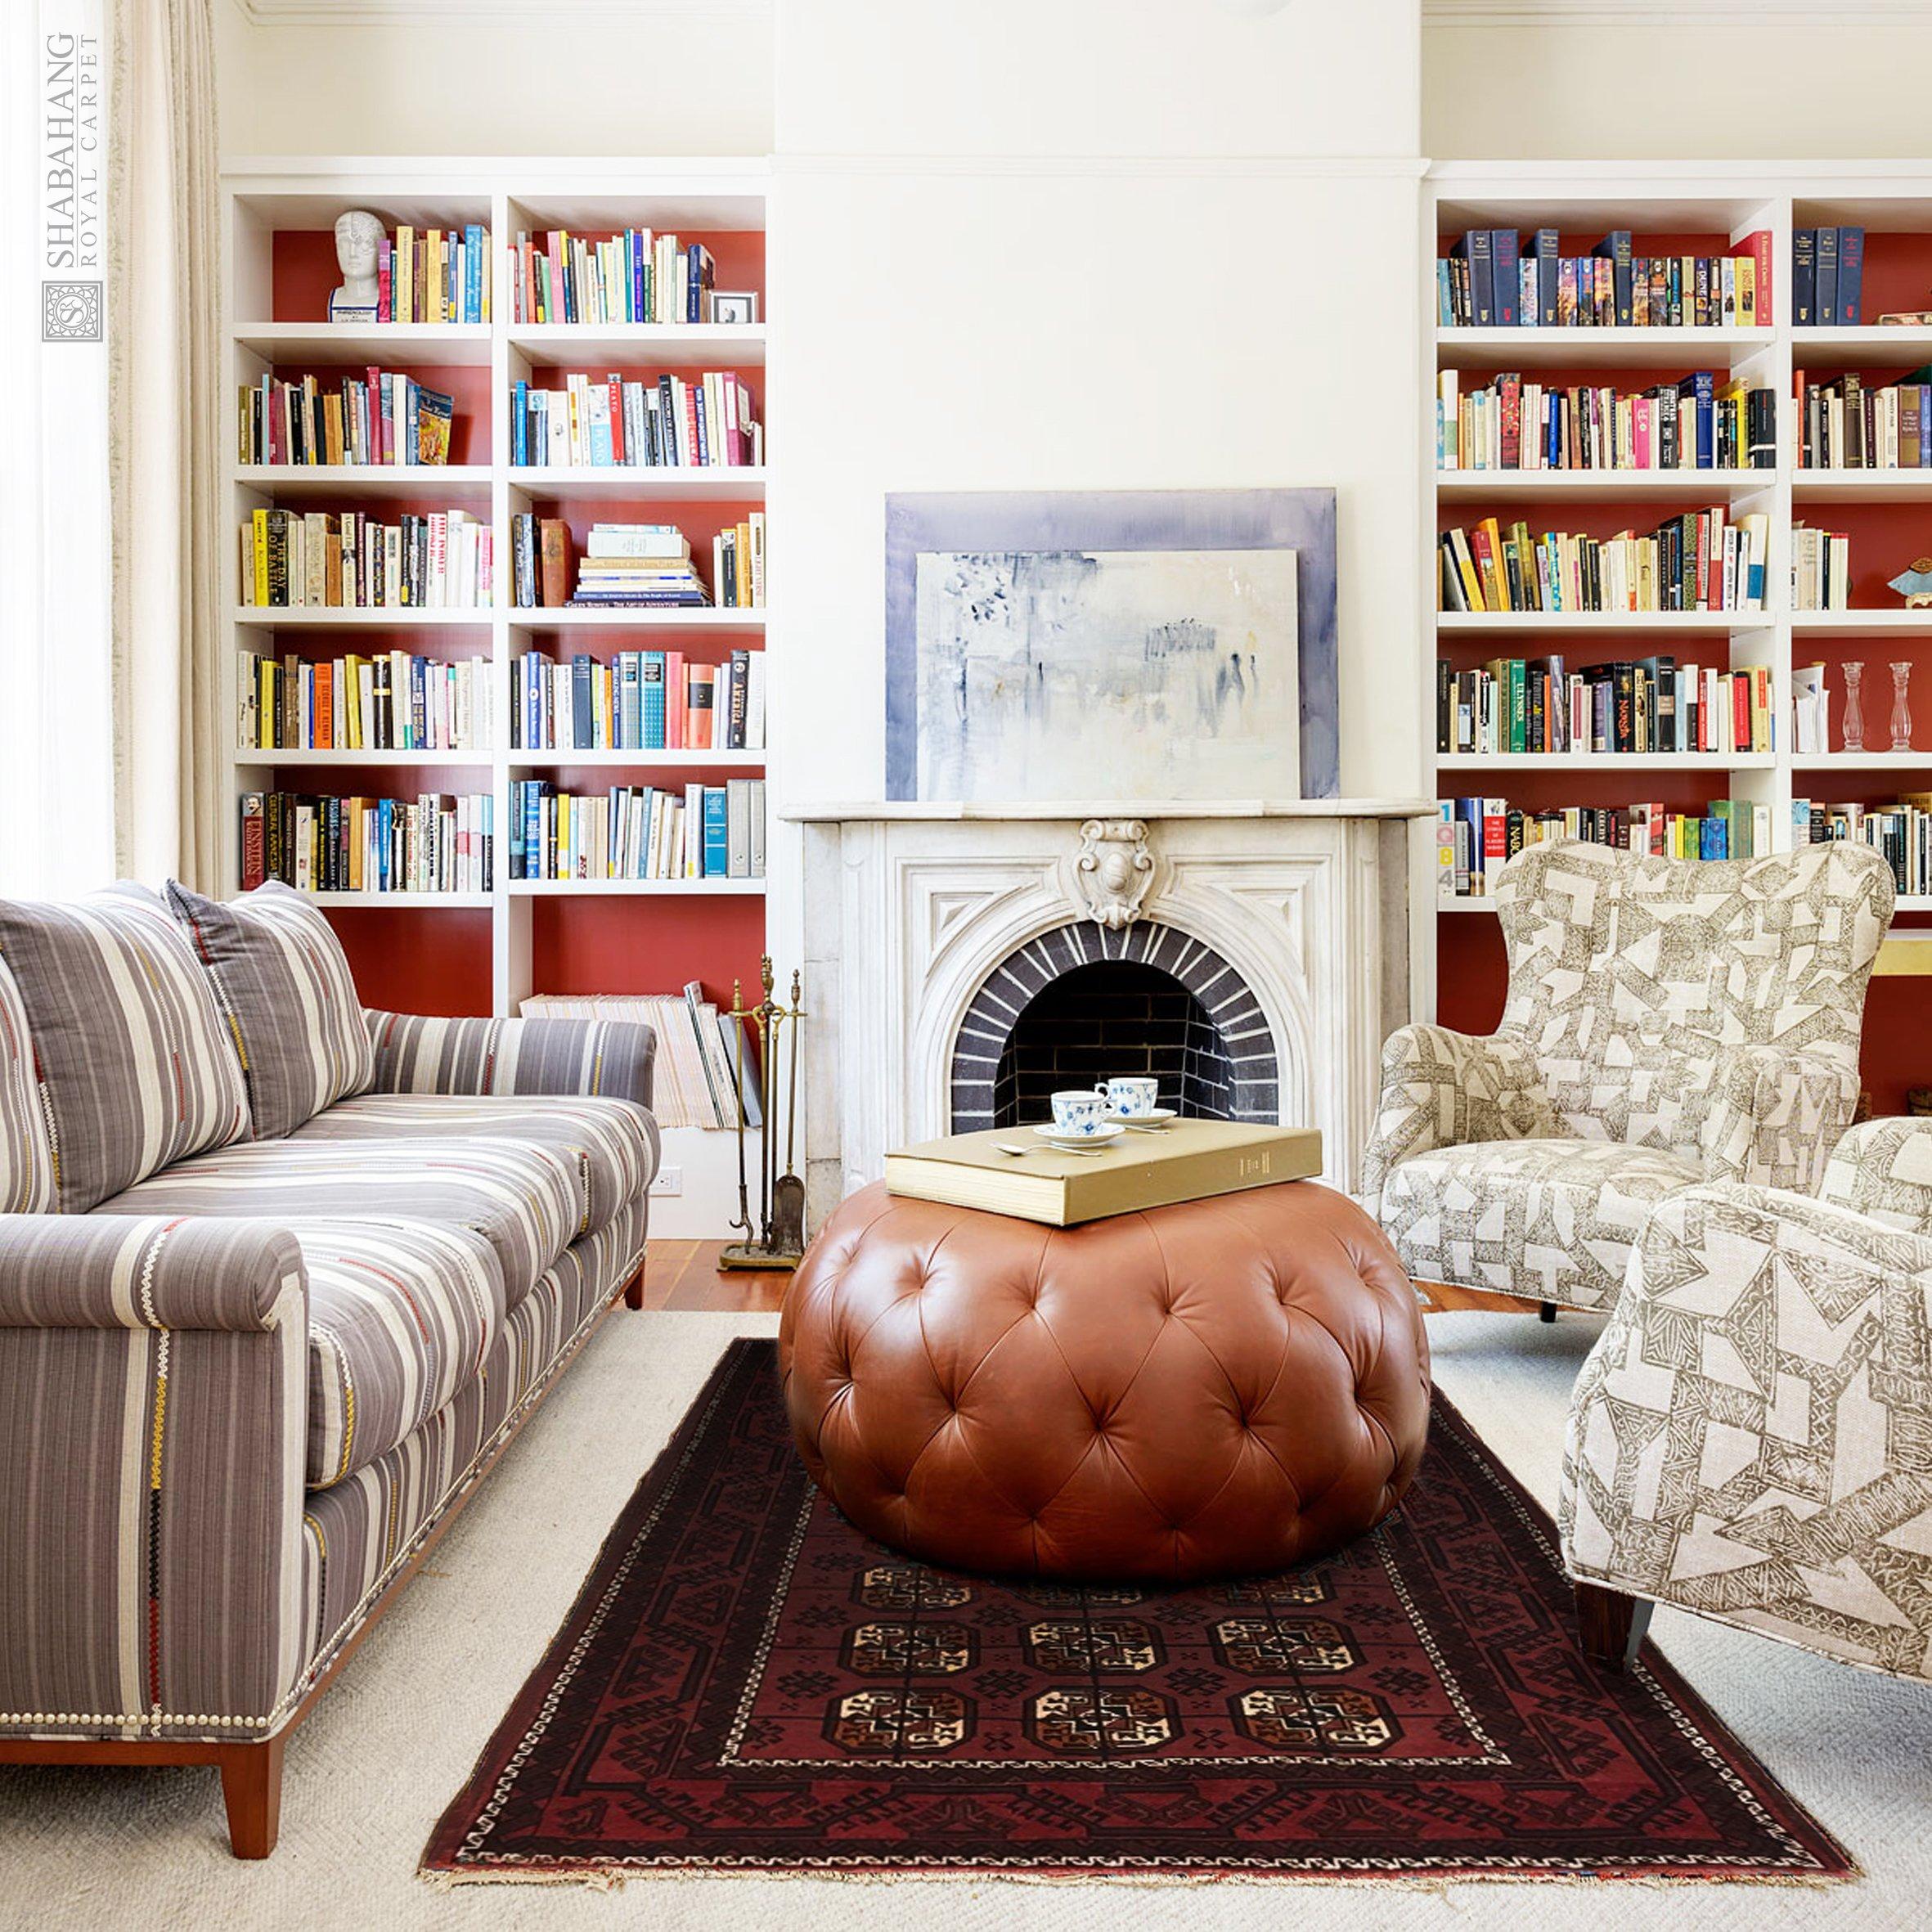 "Antique Persian Balouchi 4' 10"" x 7' 7"" Handmade Wool Area Rug - Shabahang Royal Carpet"